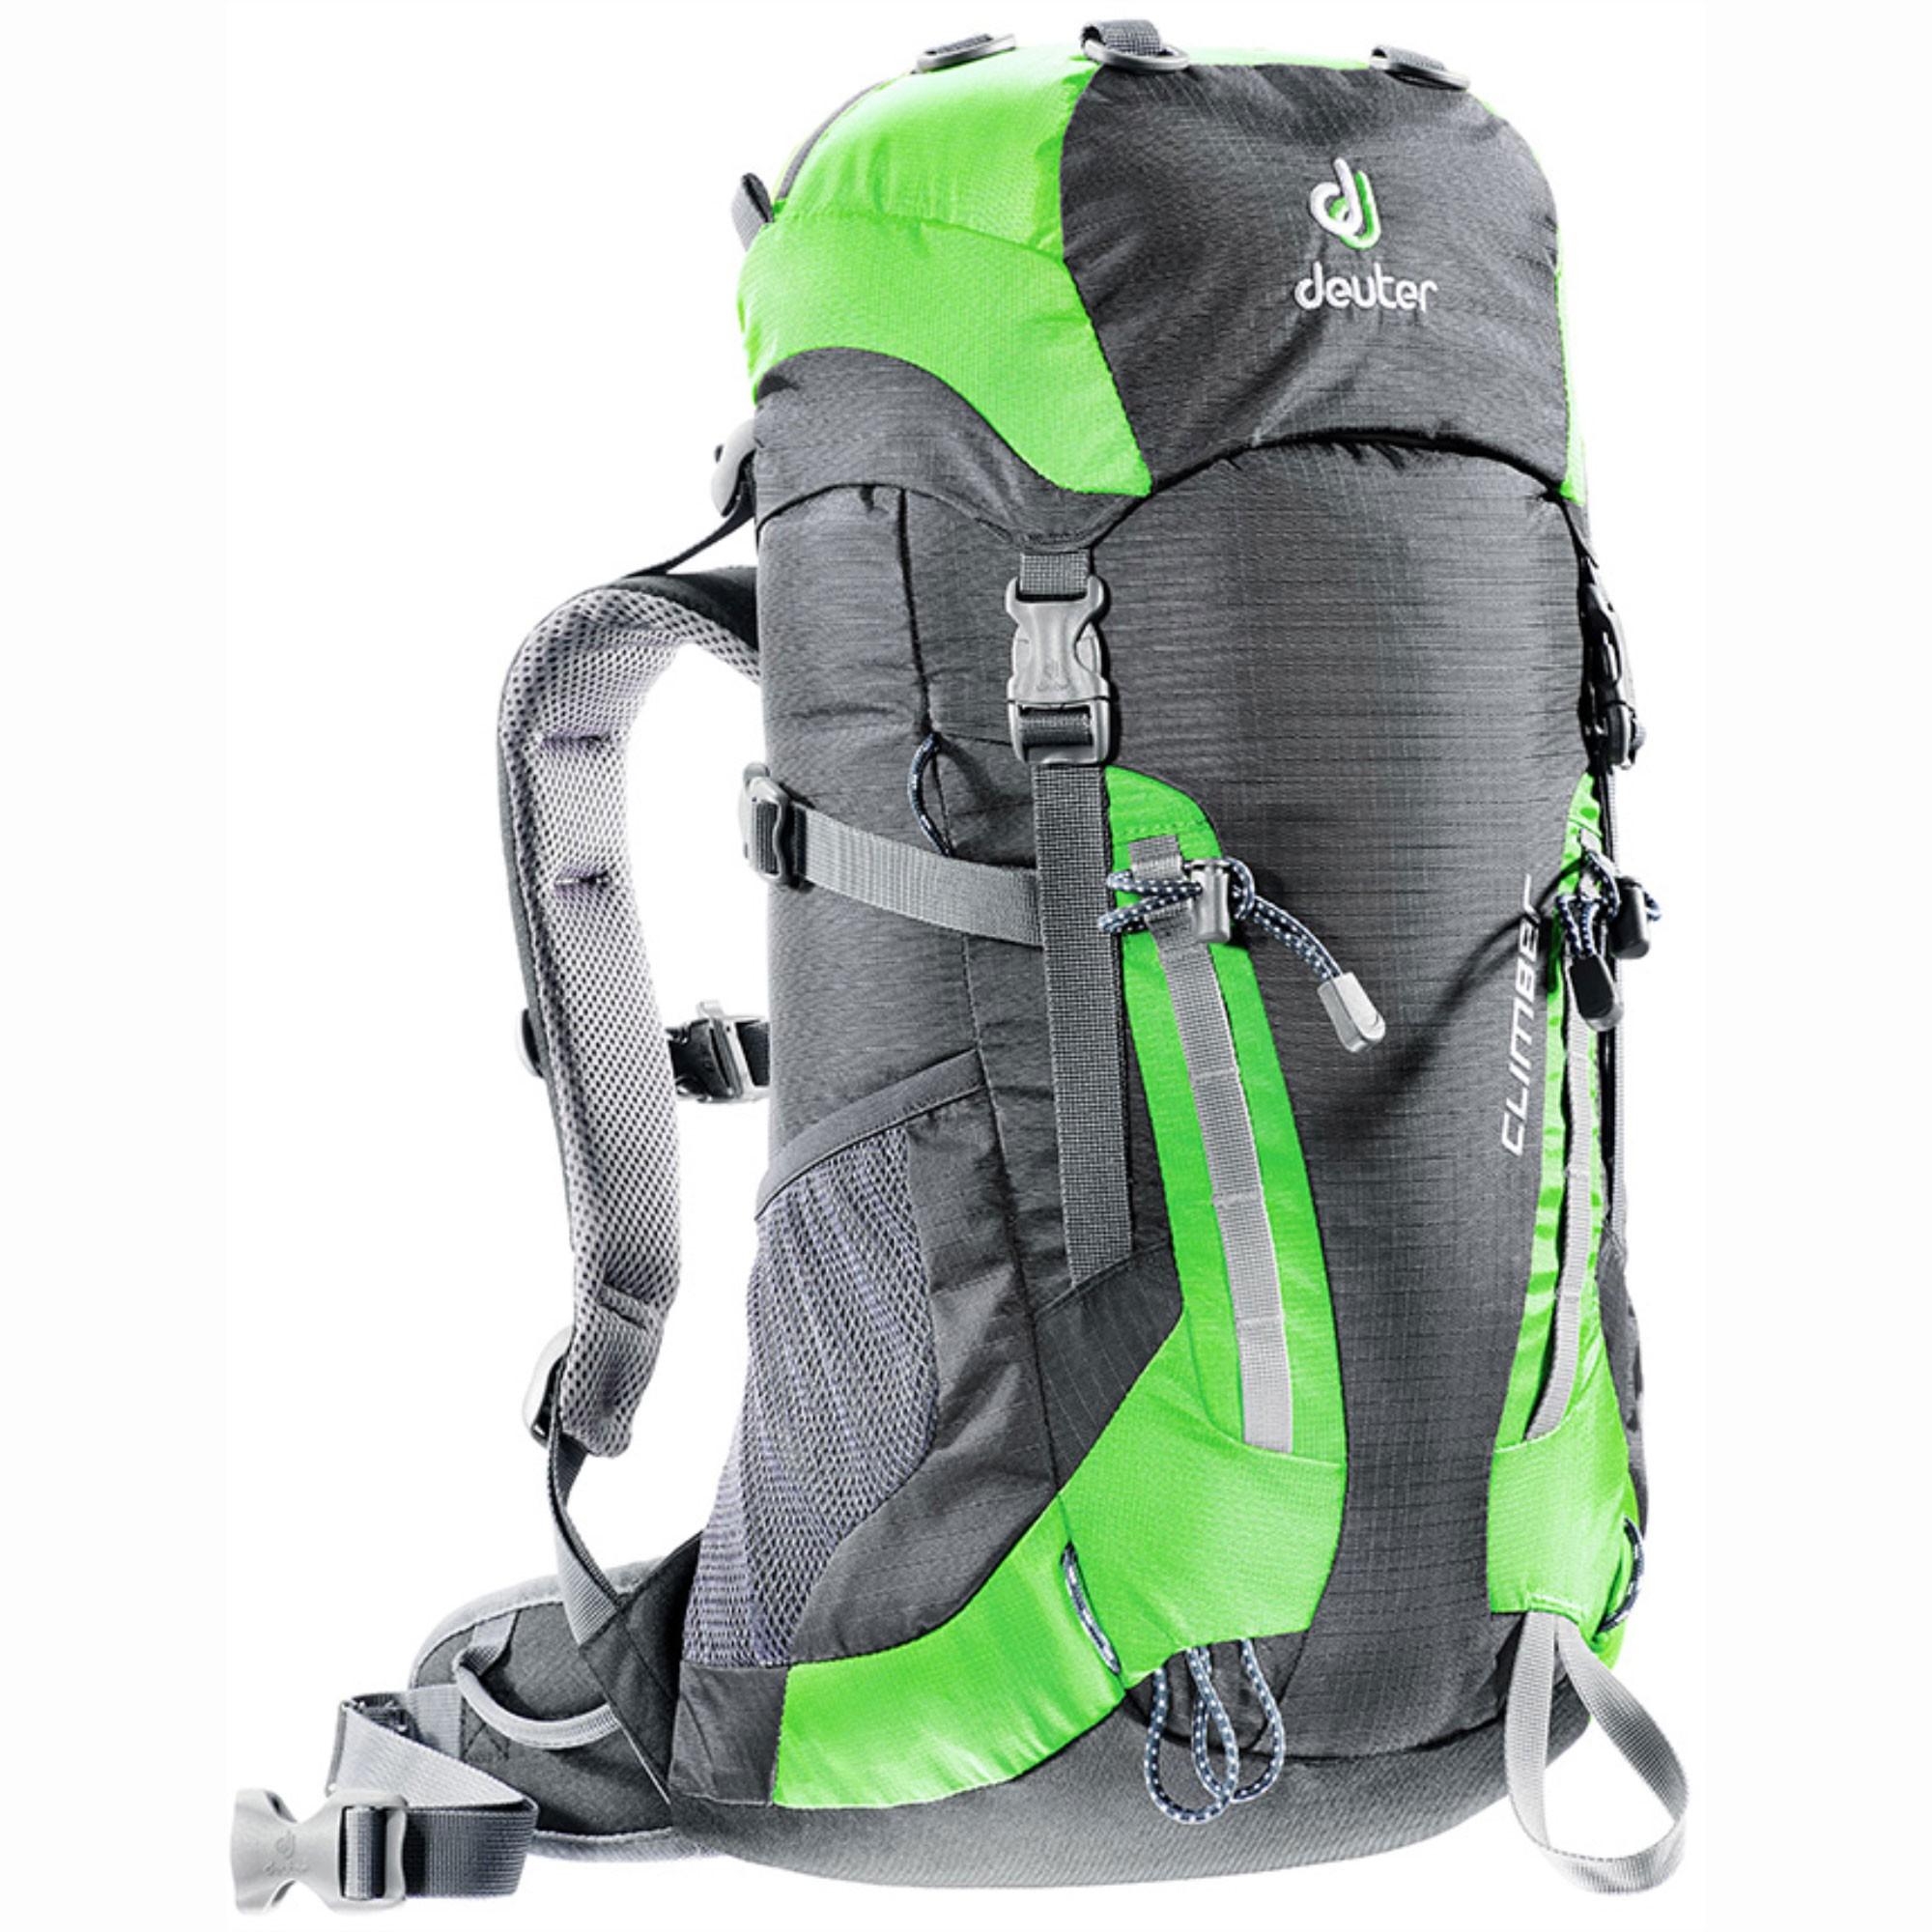 Deuter Climber Junior Rucksack - Anthracite/Spring